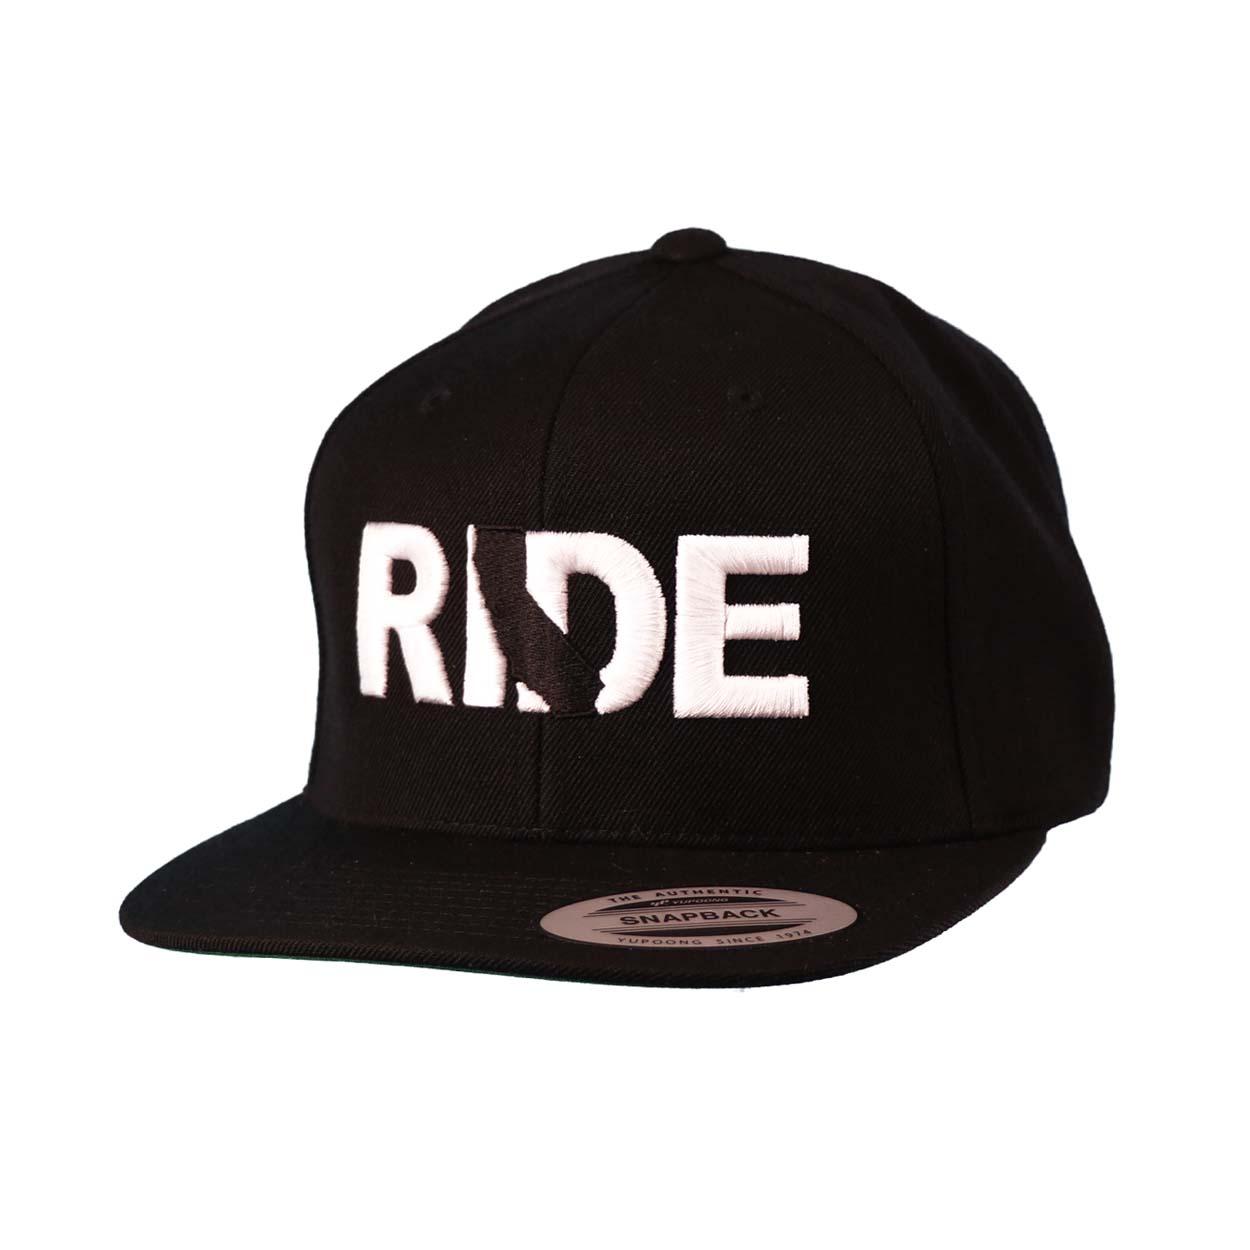 Ride California Classic Embroidered Snapback Flat Brim Hat Black/White